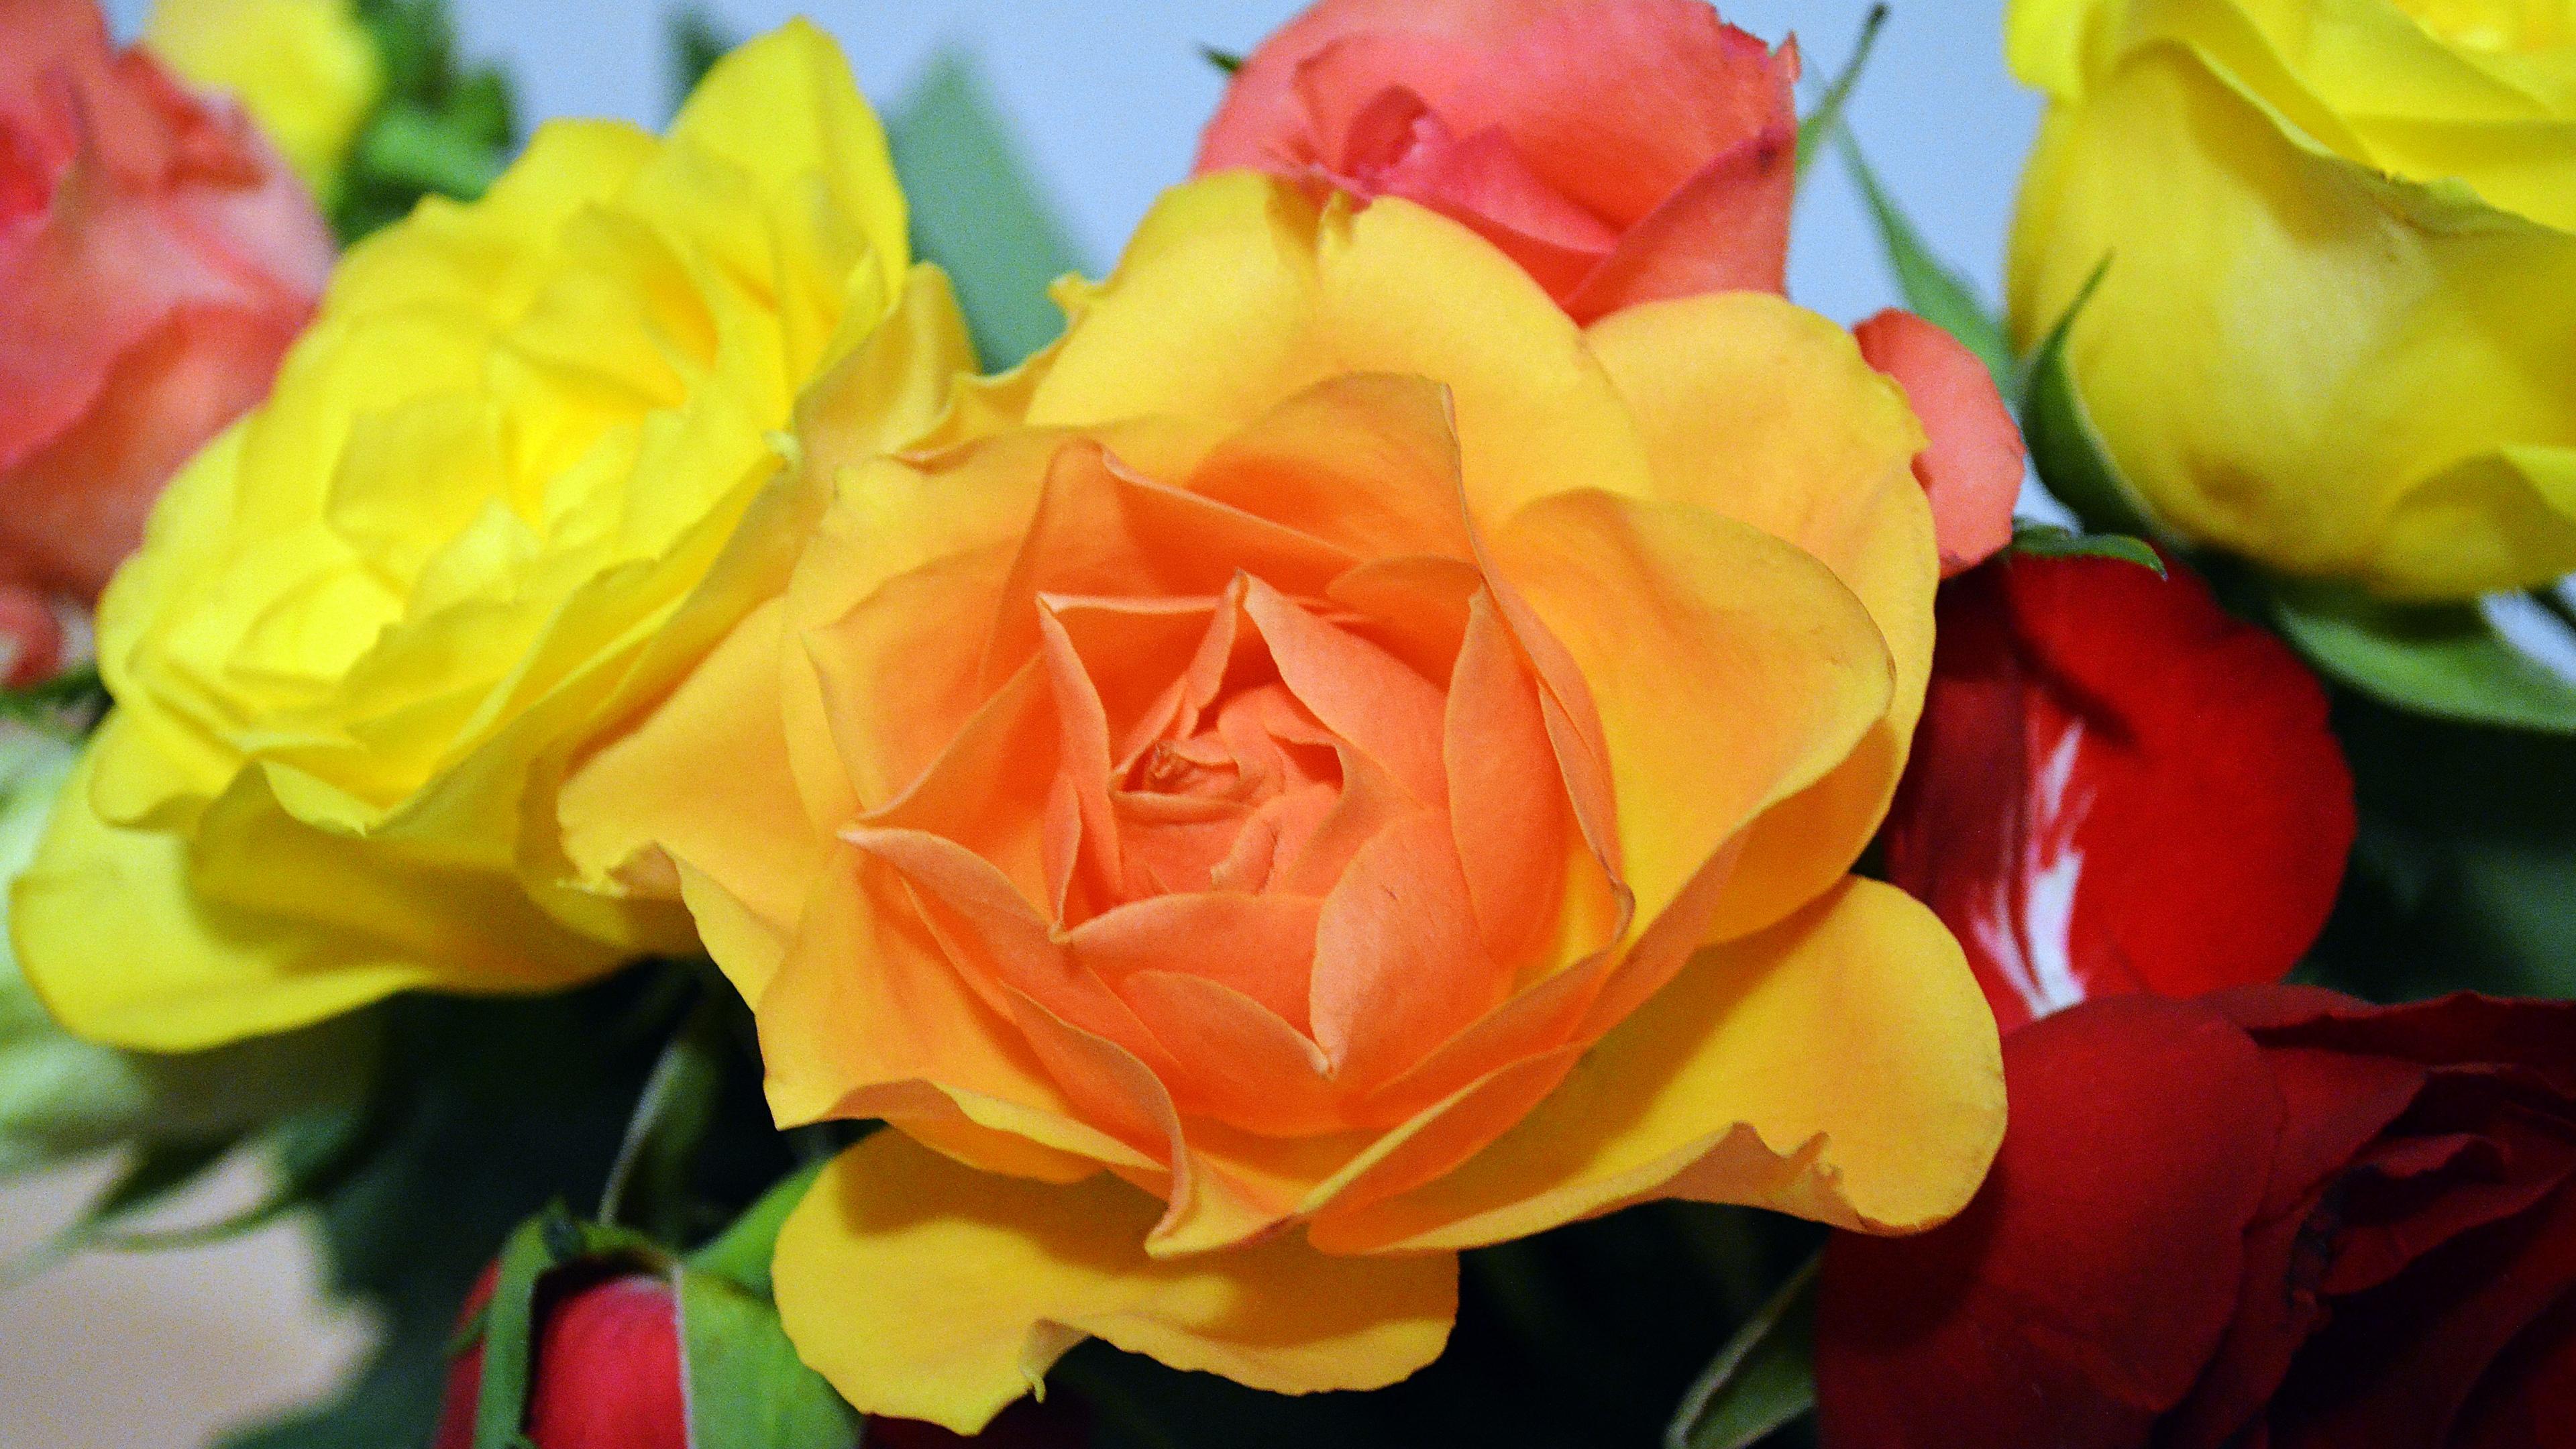 roses flower flowers 4k 1540064797 - roses, flower, flowers 4k - Roses, Flowers, flower